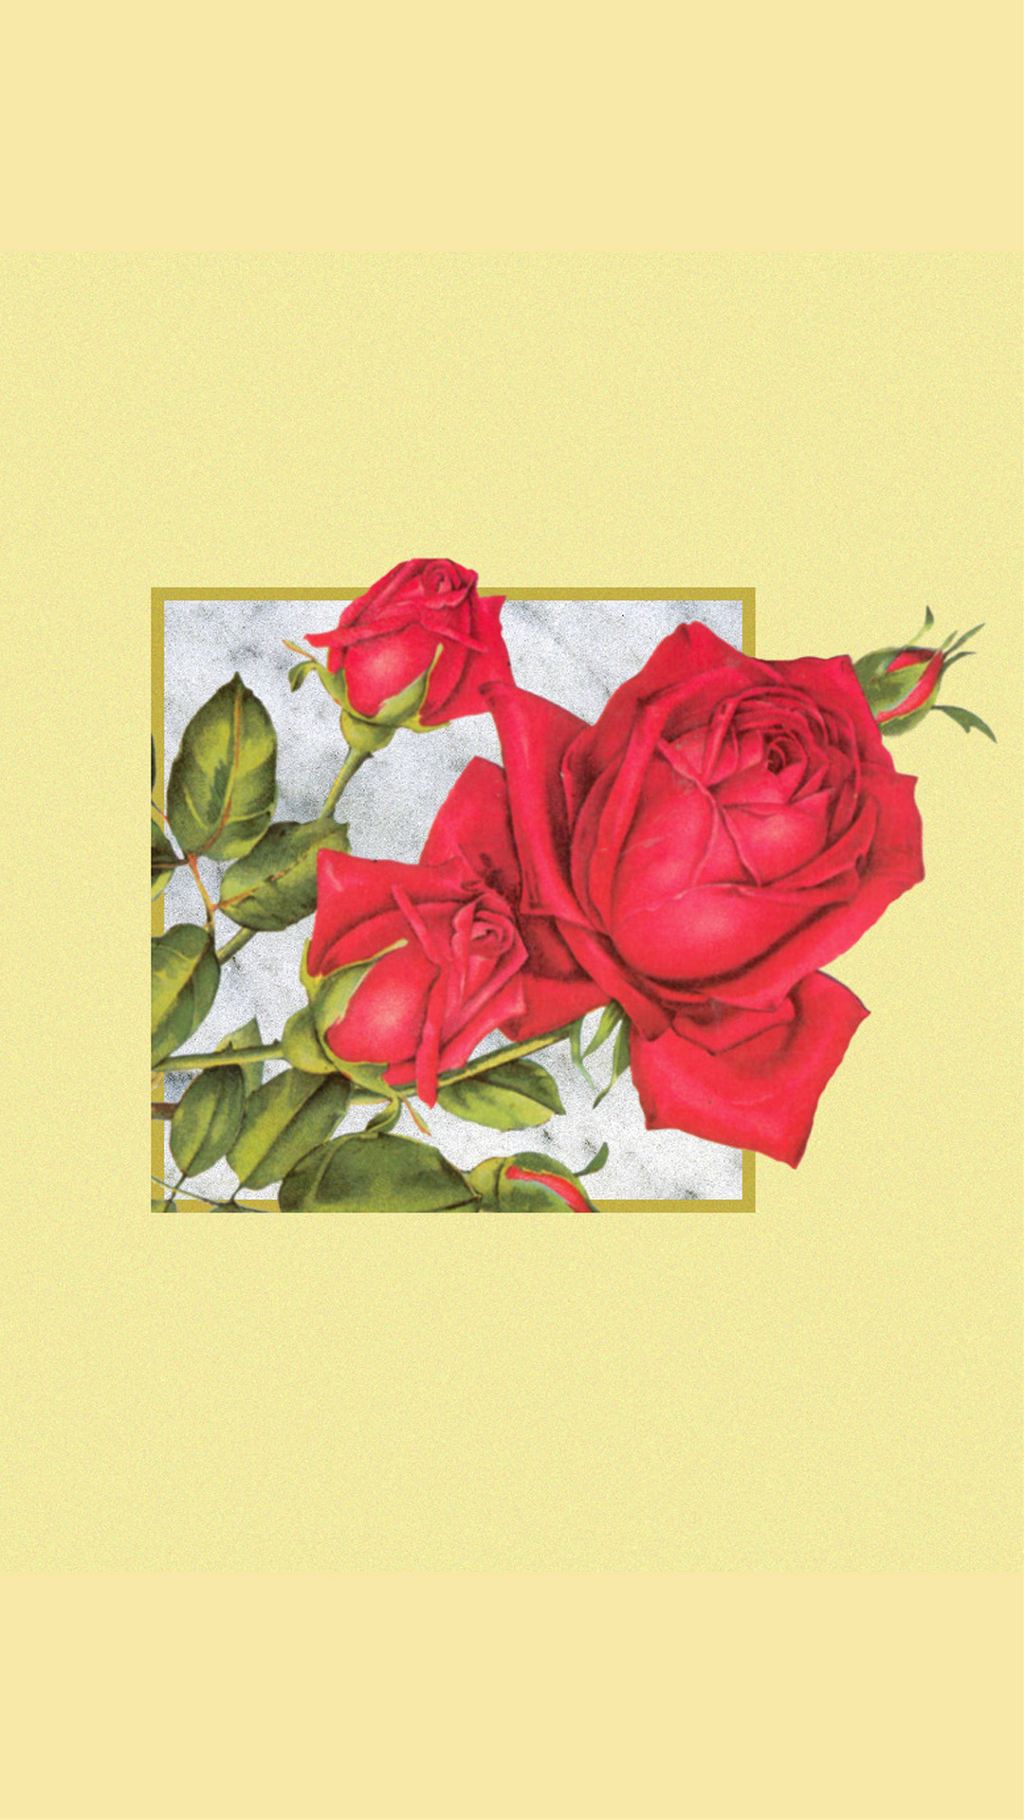 wallpaper flowers aesthetic freetoedit